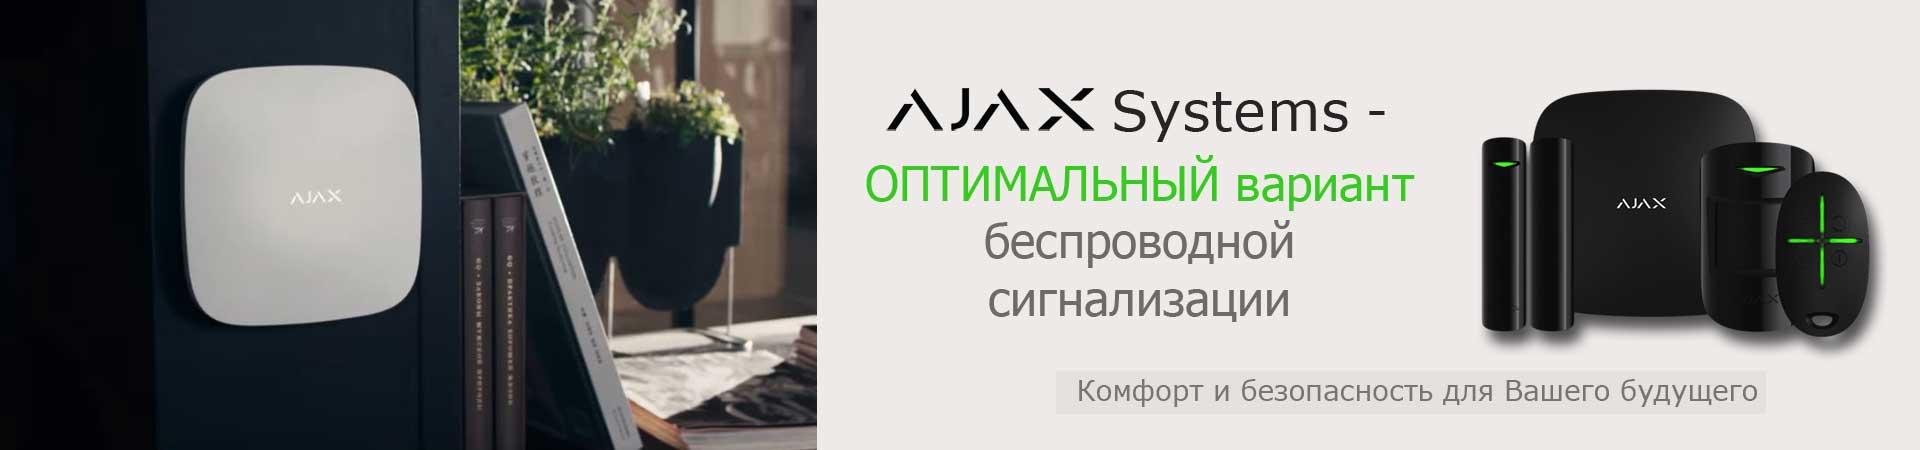 banner-ajax-2